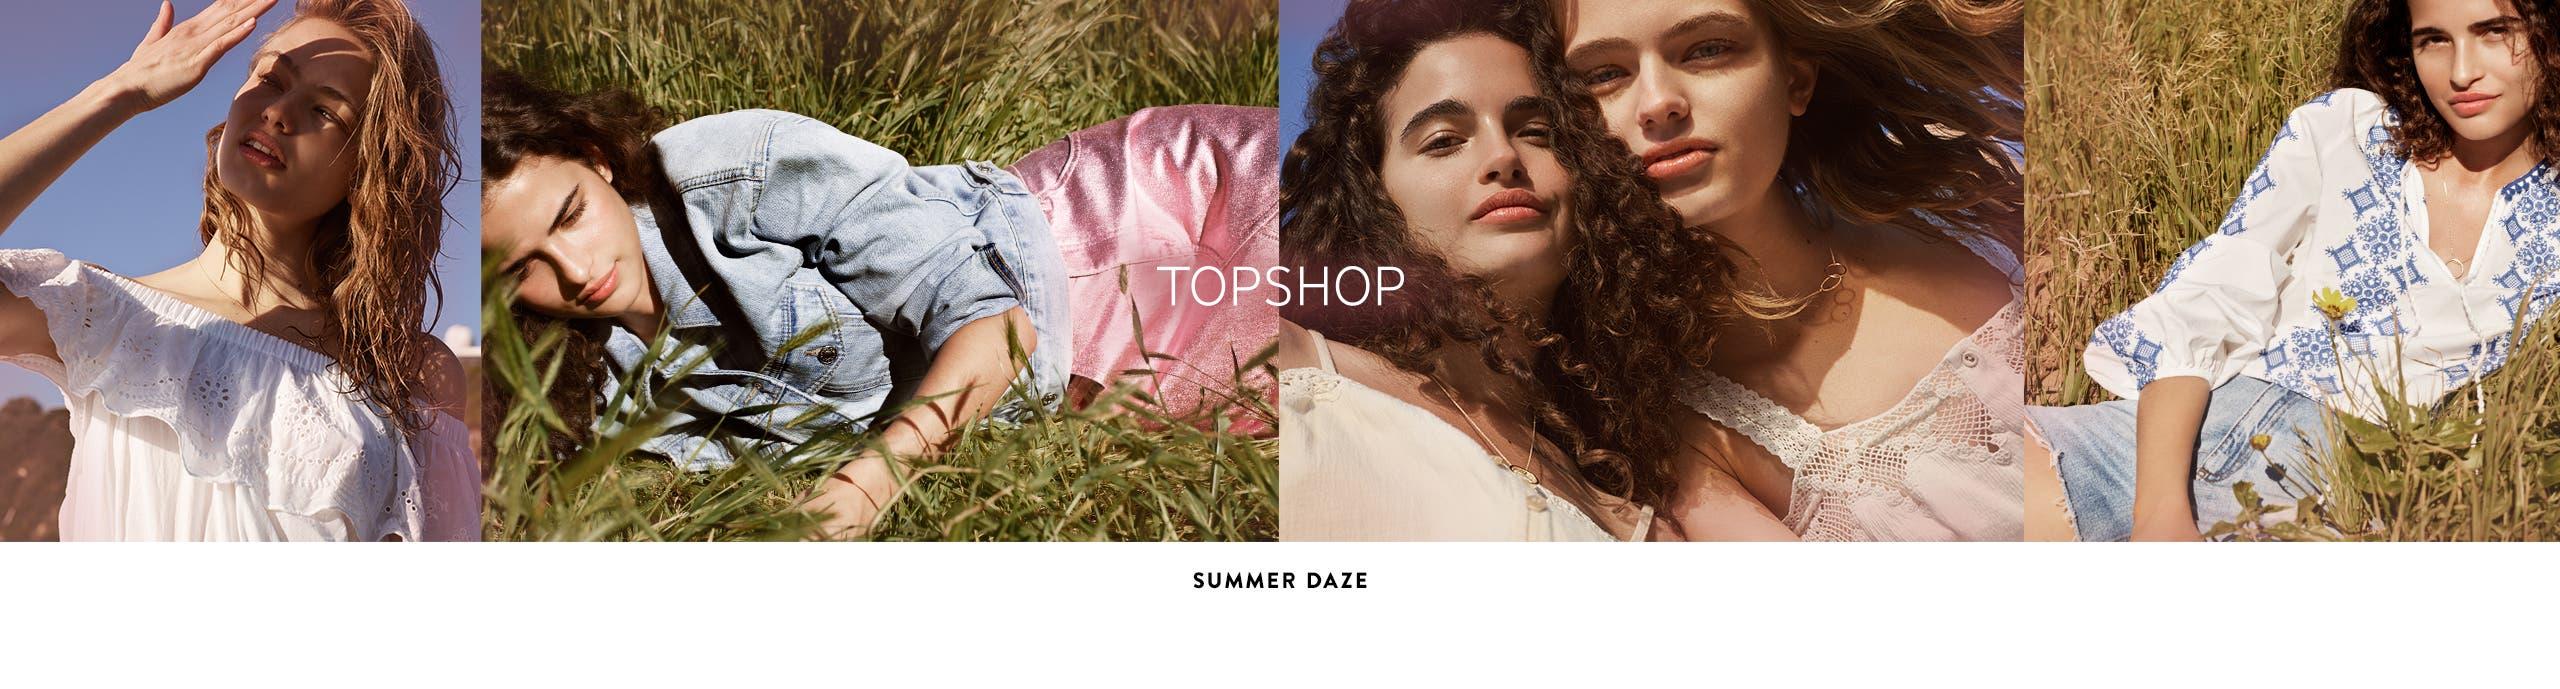 Topshop: summer daze.